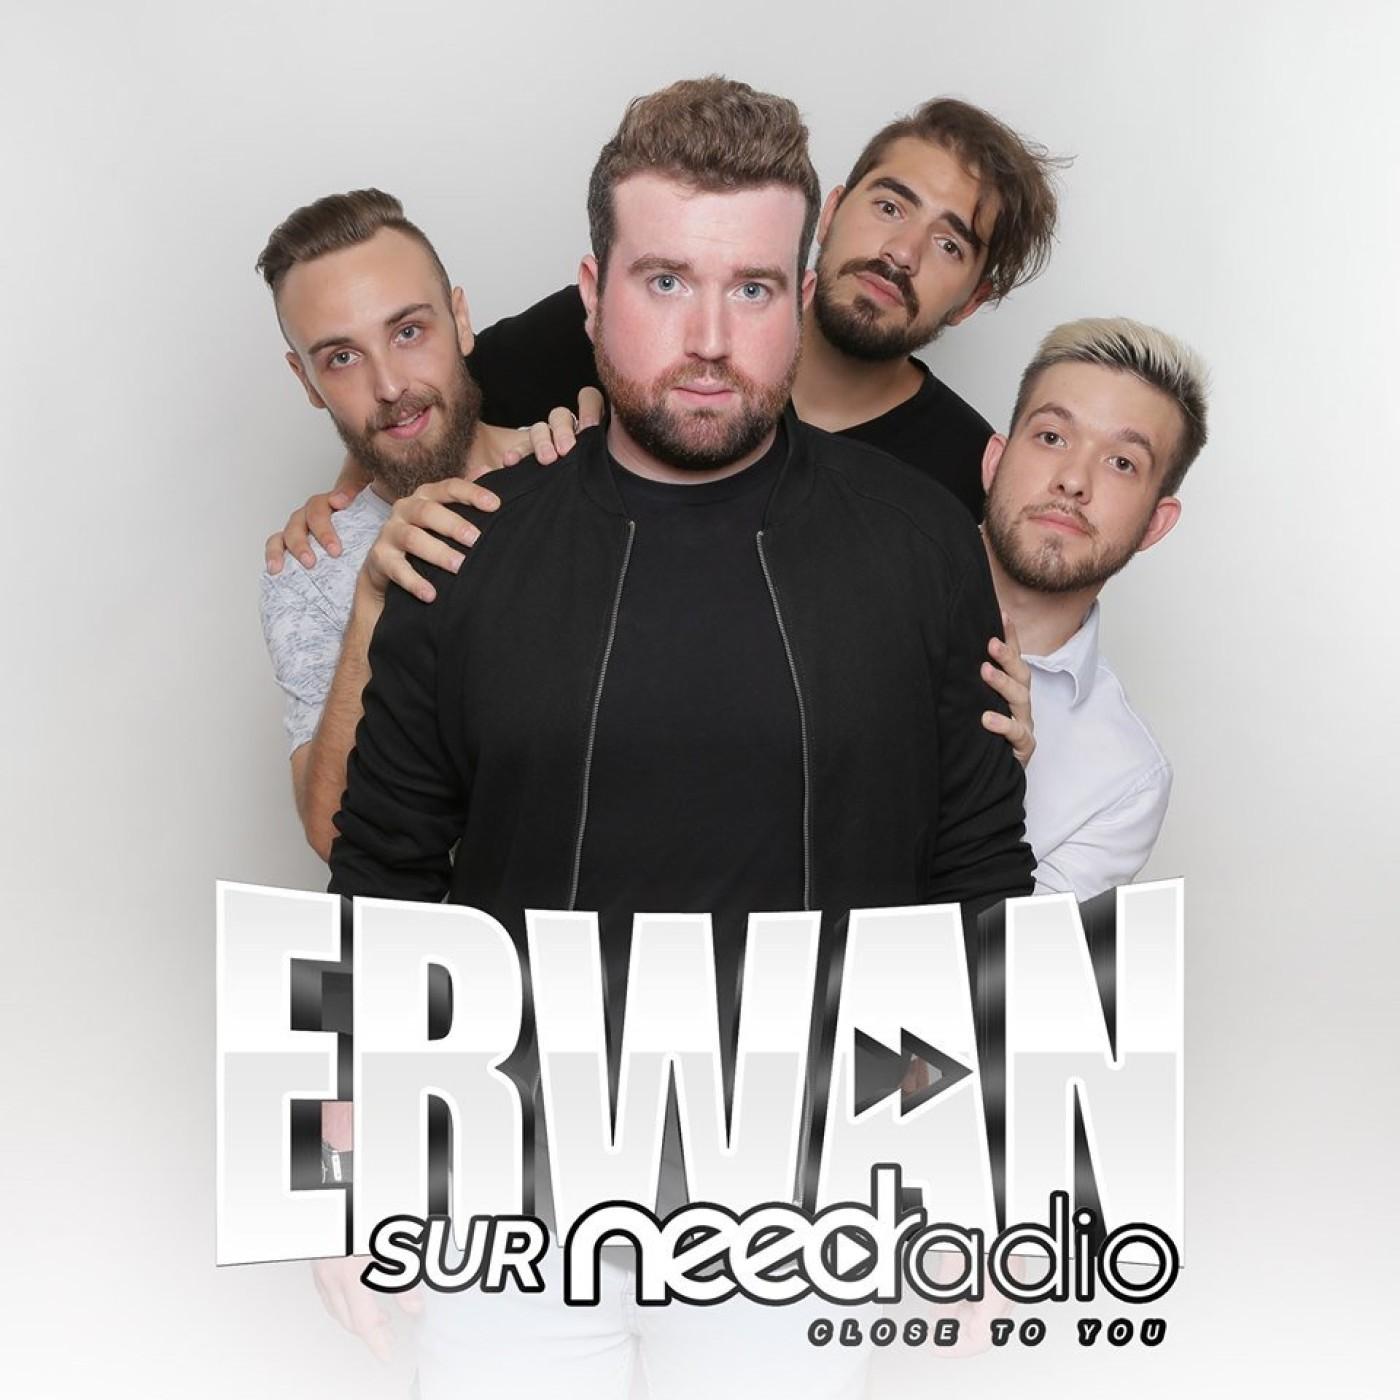 Erwan sur NEED Radio S2 #11 (La DERNIERE de 2019)